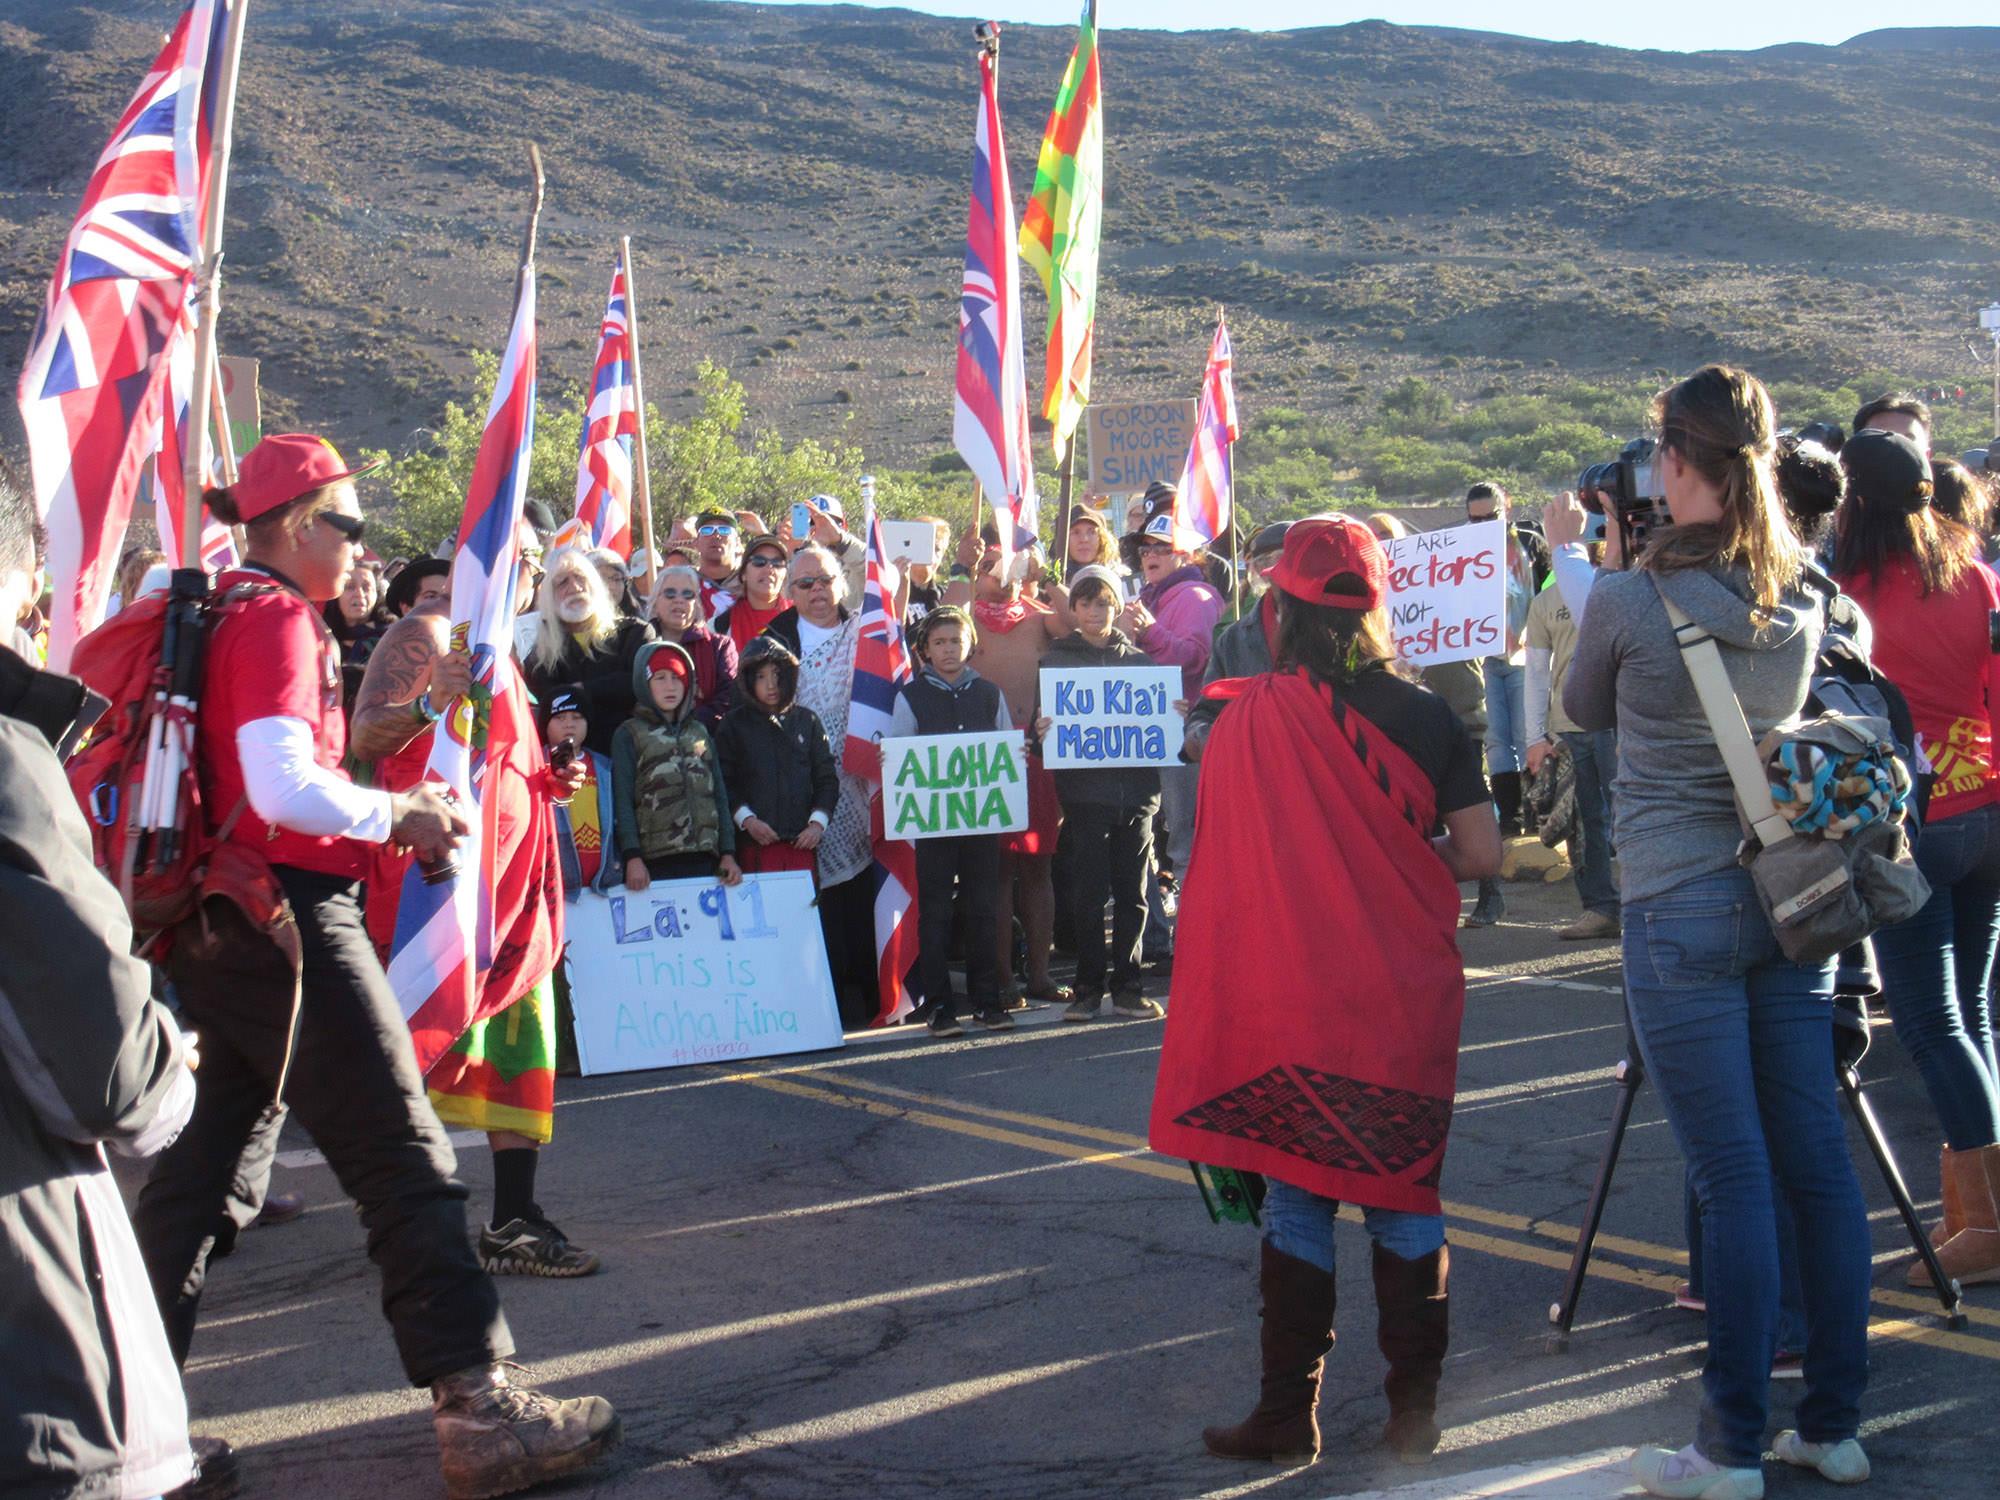 "Fig. 23 Protectors on Mauna Kea (Mauna a Wākea), Hawai'i Island, with signage ""We are Protectors, not Protestors,"" June 2015. Photo: ©Greg Johnson"